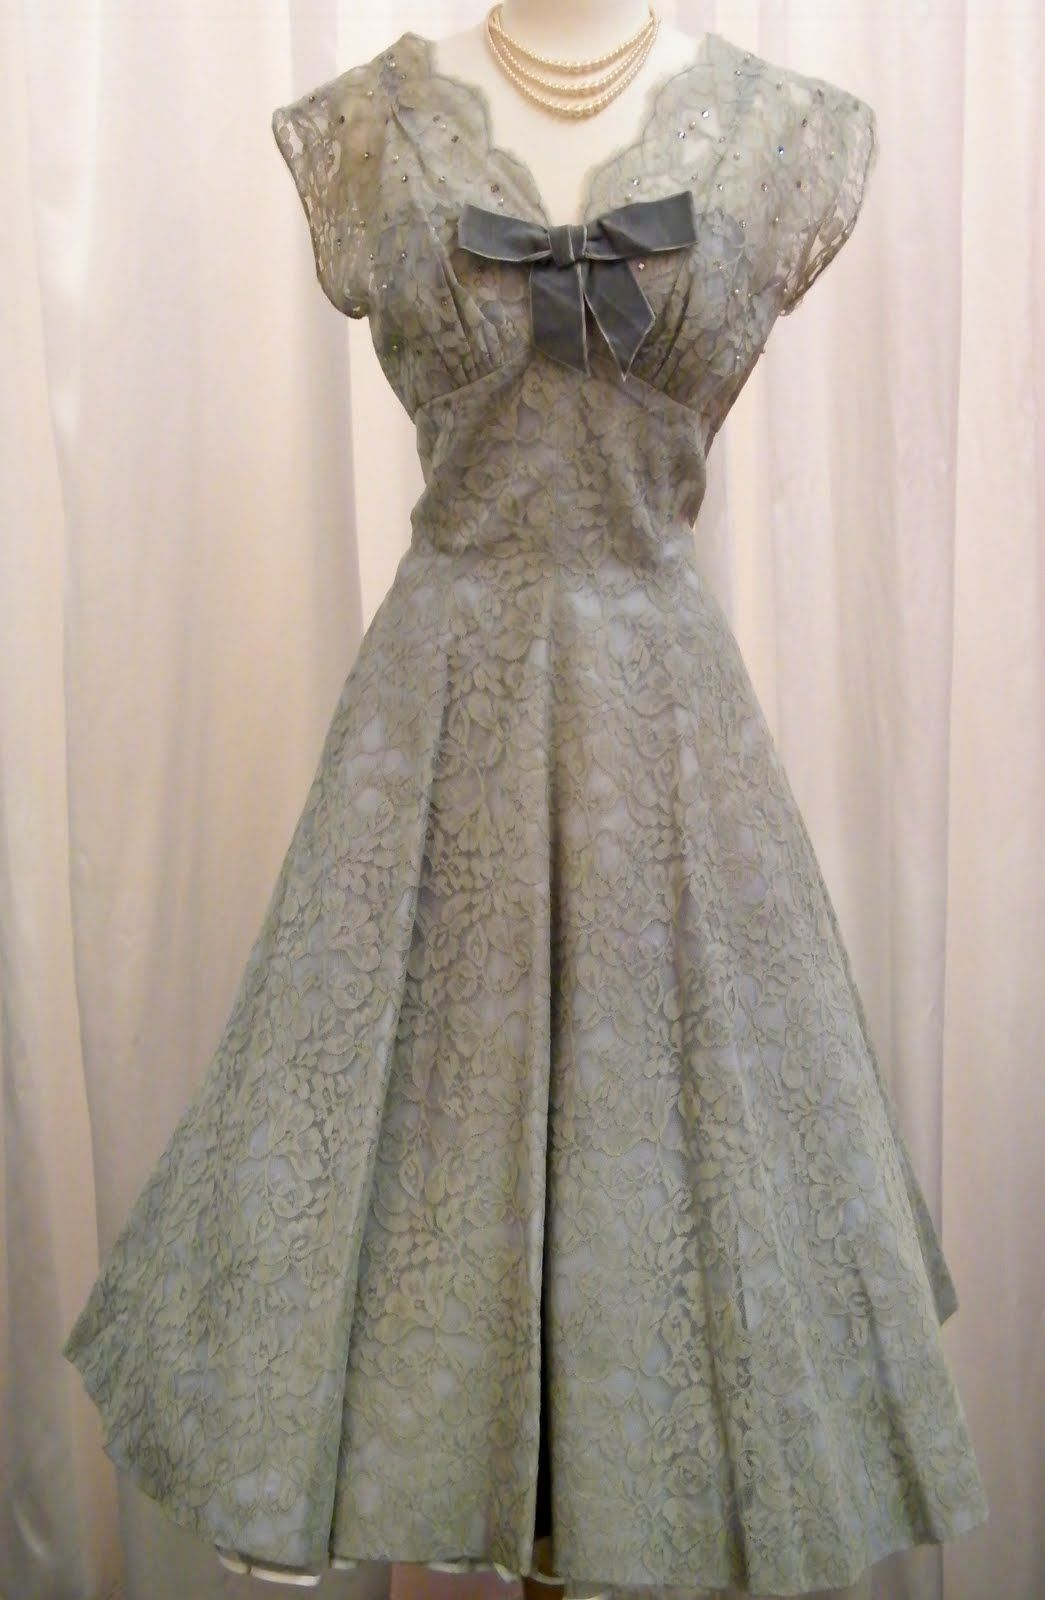 Dirty Fabulous: Dirty Fabulous Vintage Dresses | Dresses to make ...